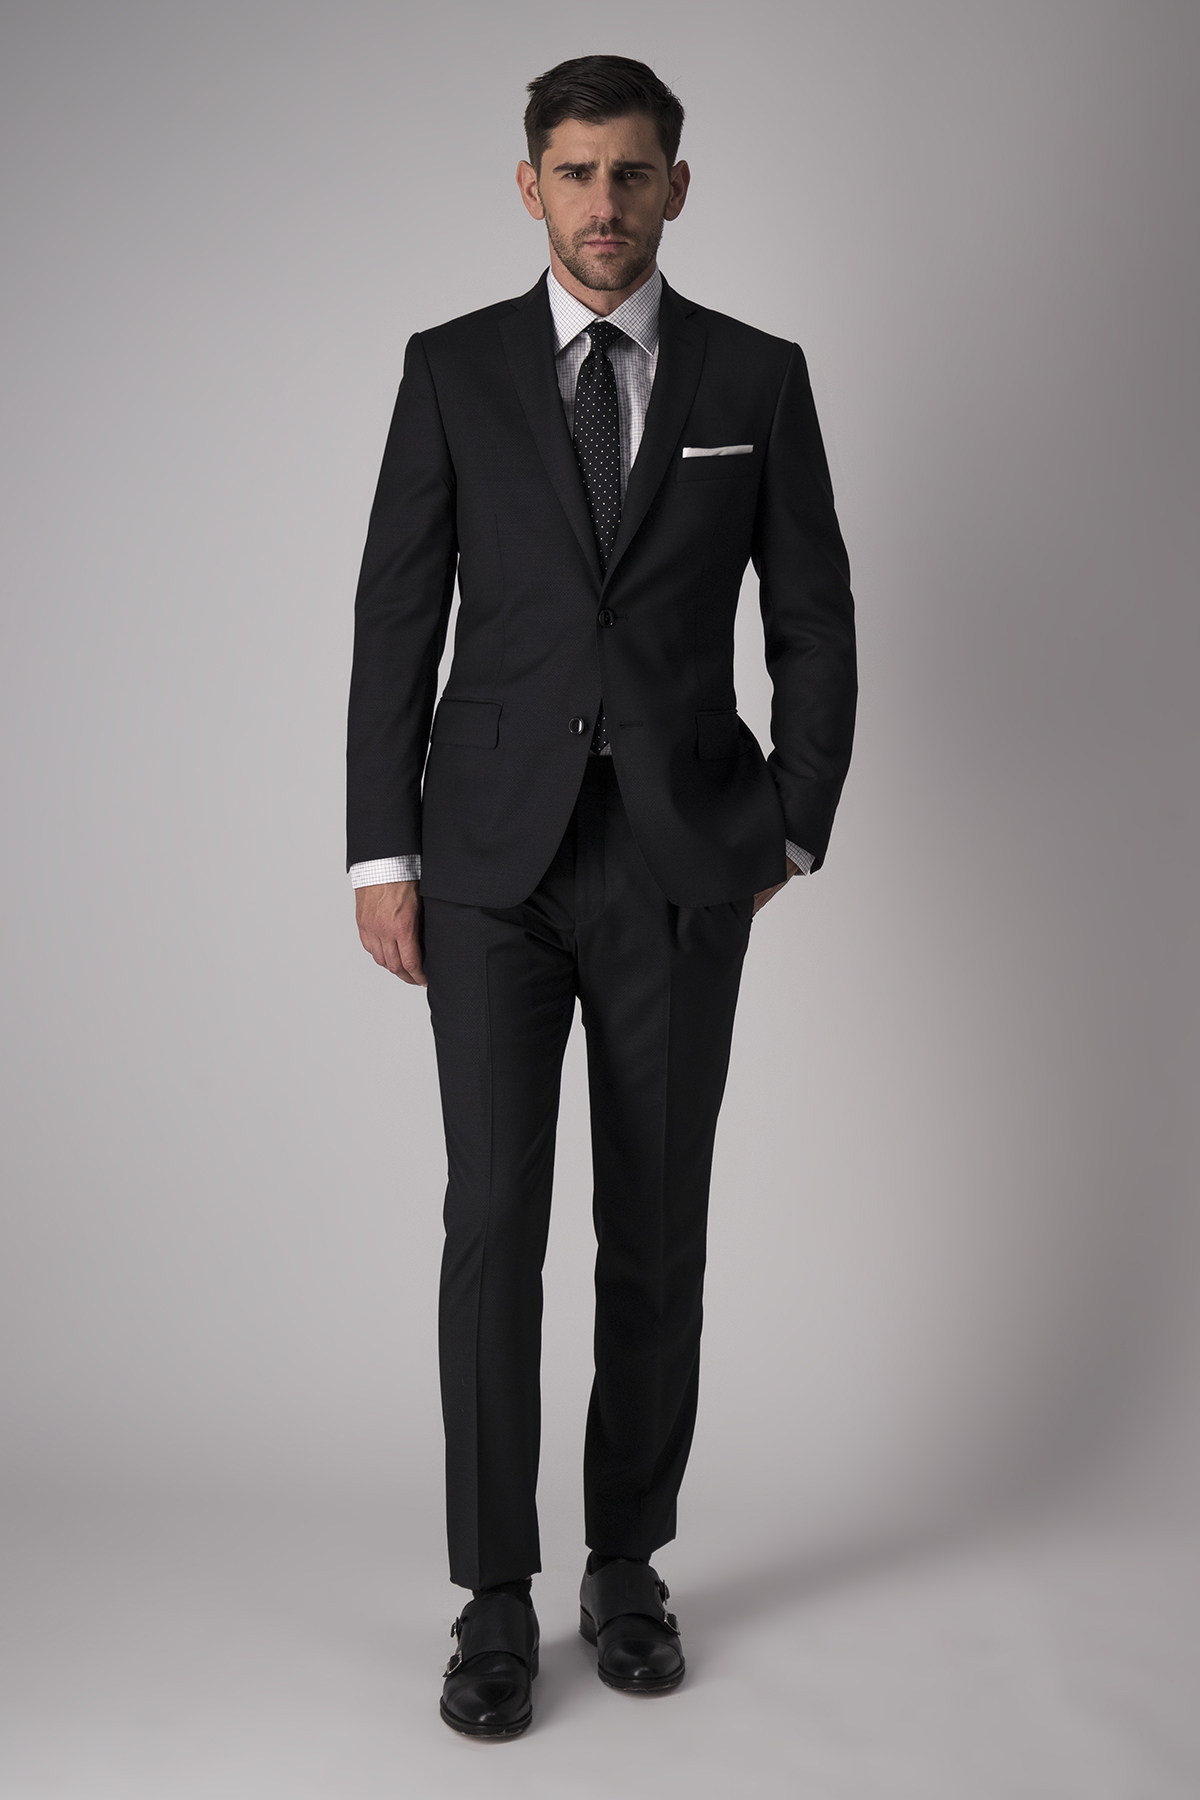 Traje Robert´s, slim fit, color negro liso.